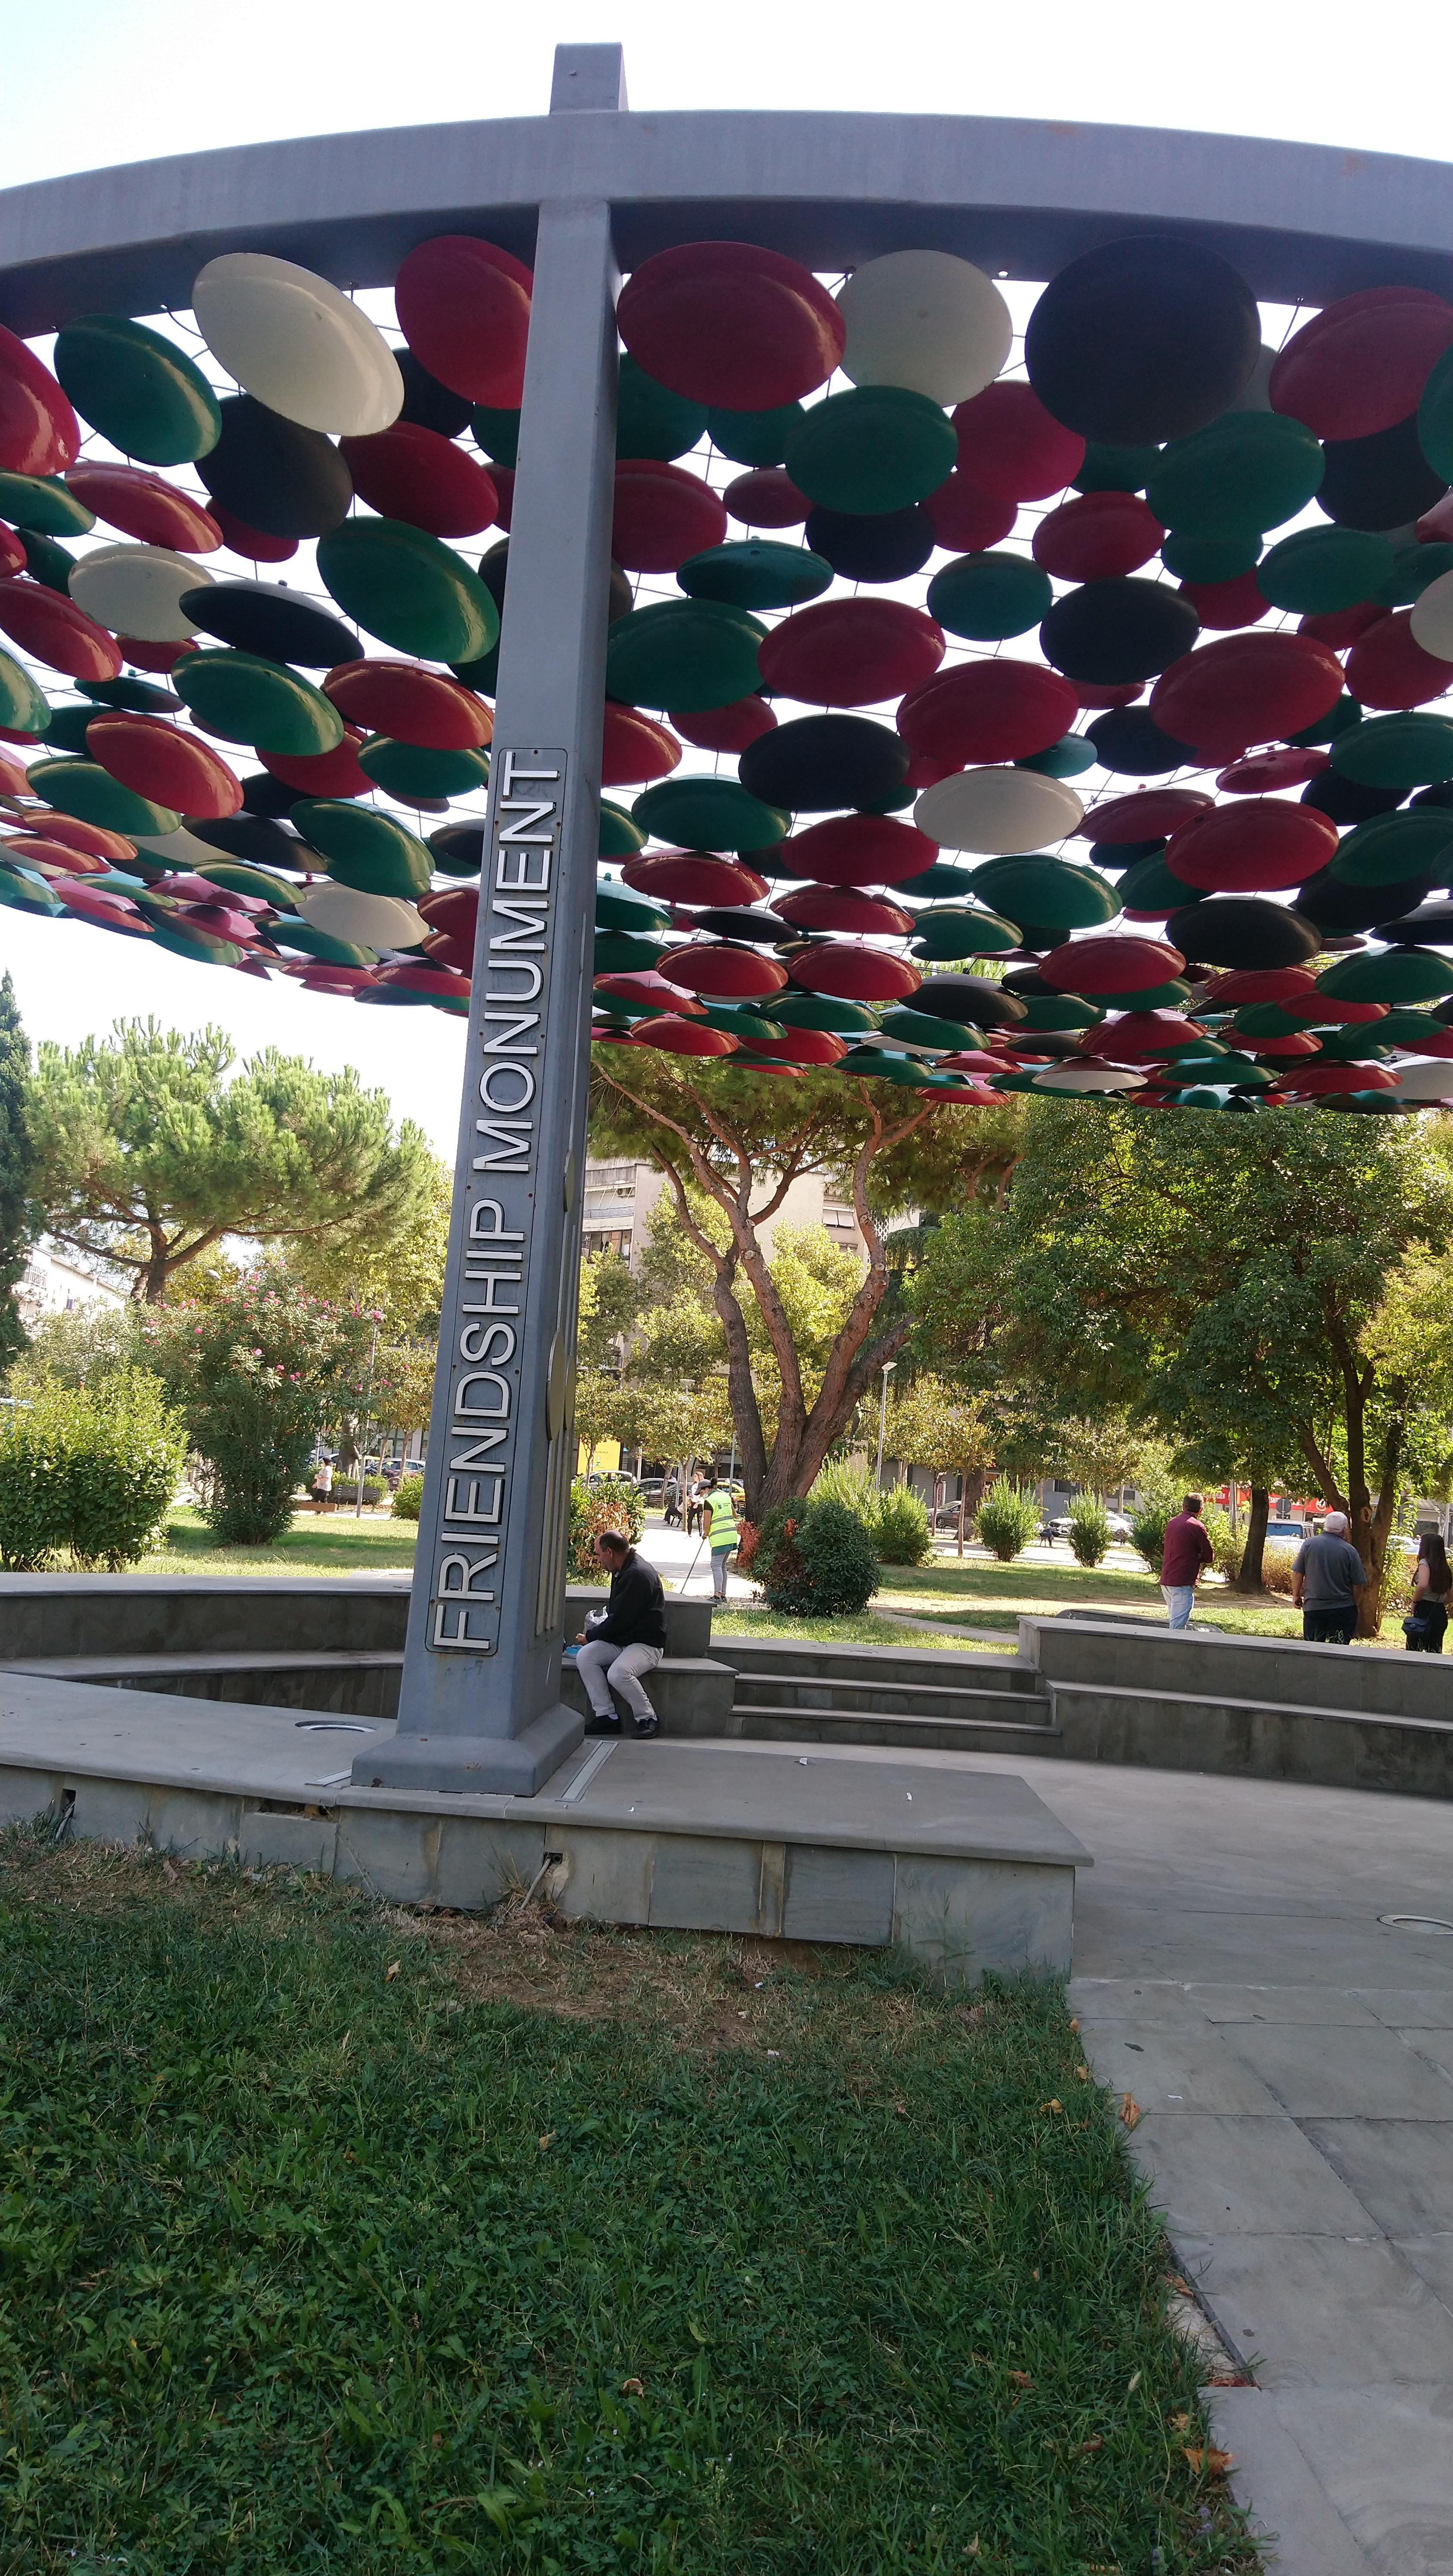 MonumentoamiciziaJPG